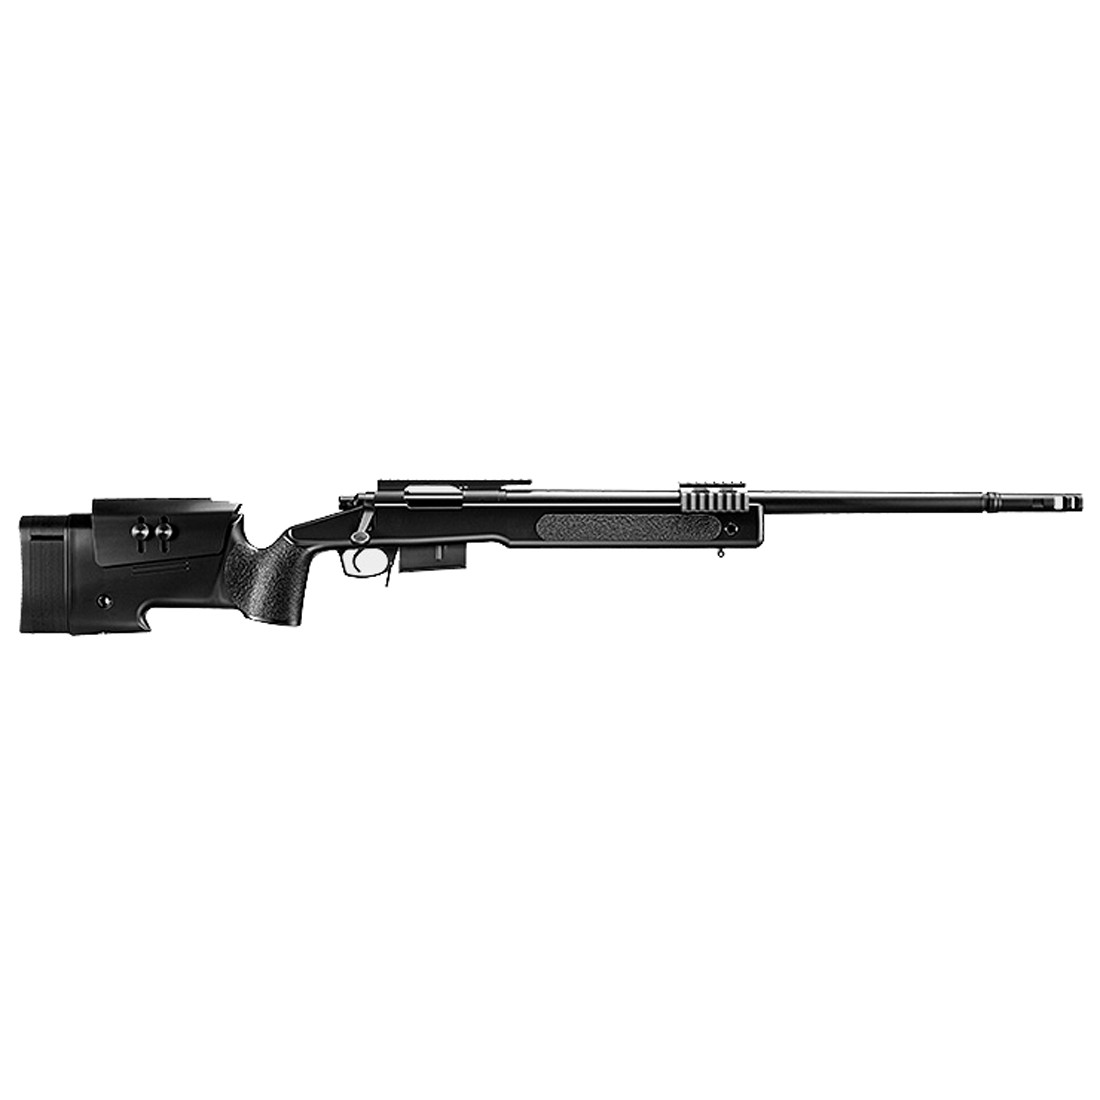 Tokyo Marui M40A5 U.S. Marine Airsoft Spring Sniper Rifle - Black